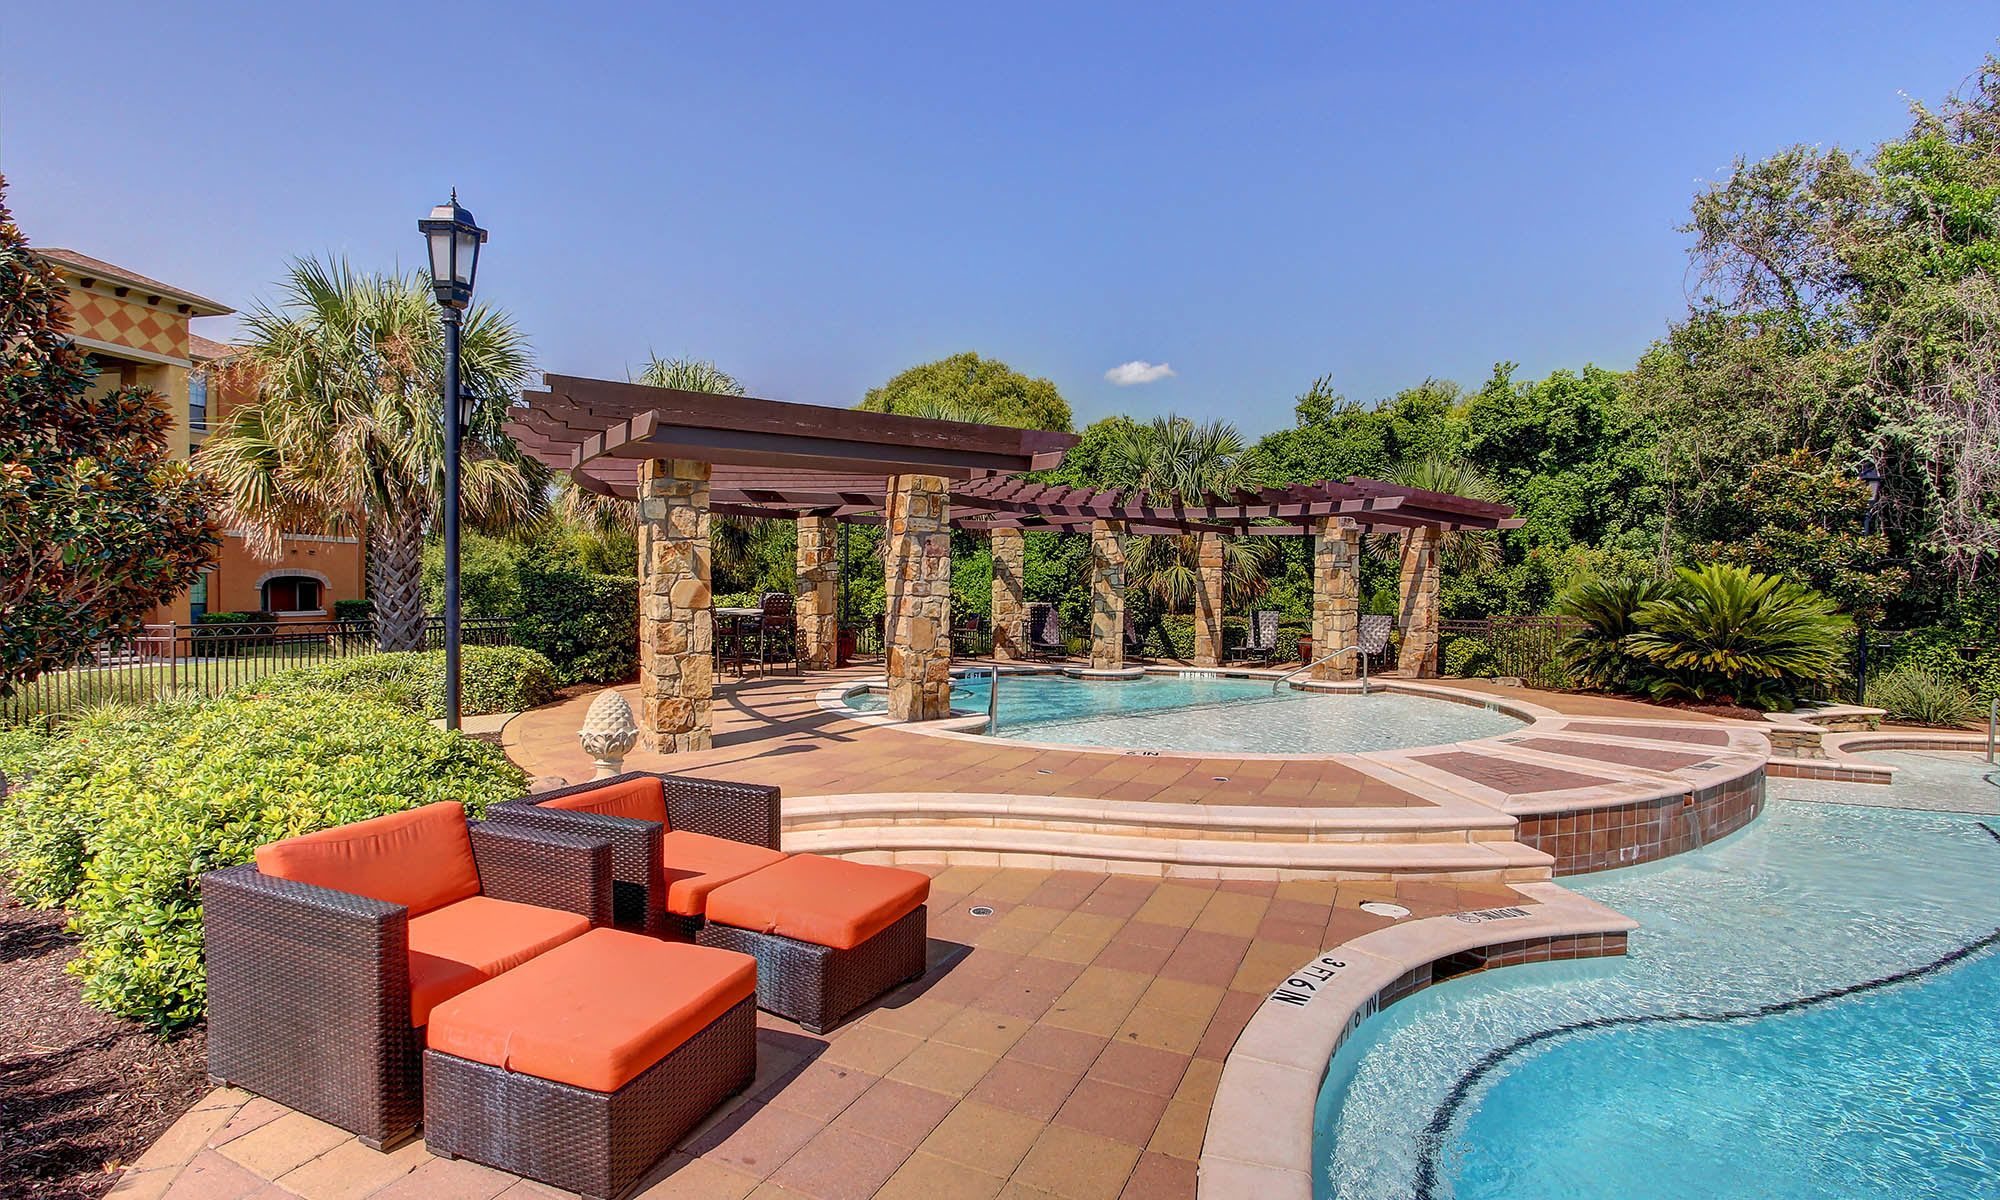 Austin, TX Apartments for Rent | The Bridge at Center Ridge